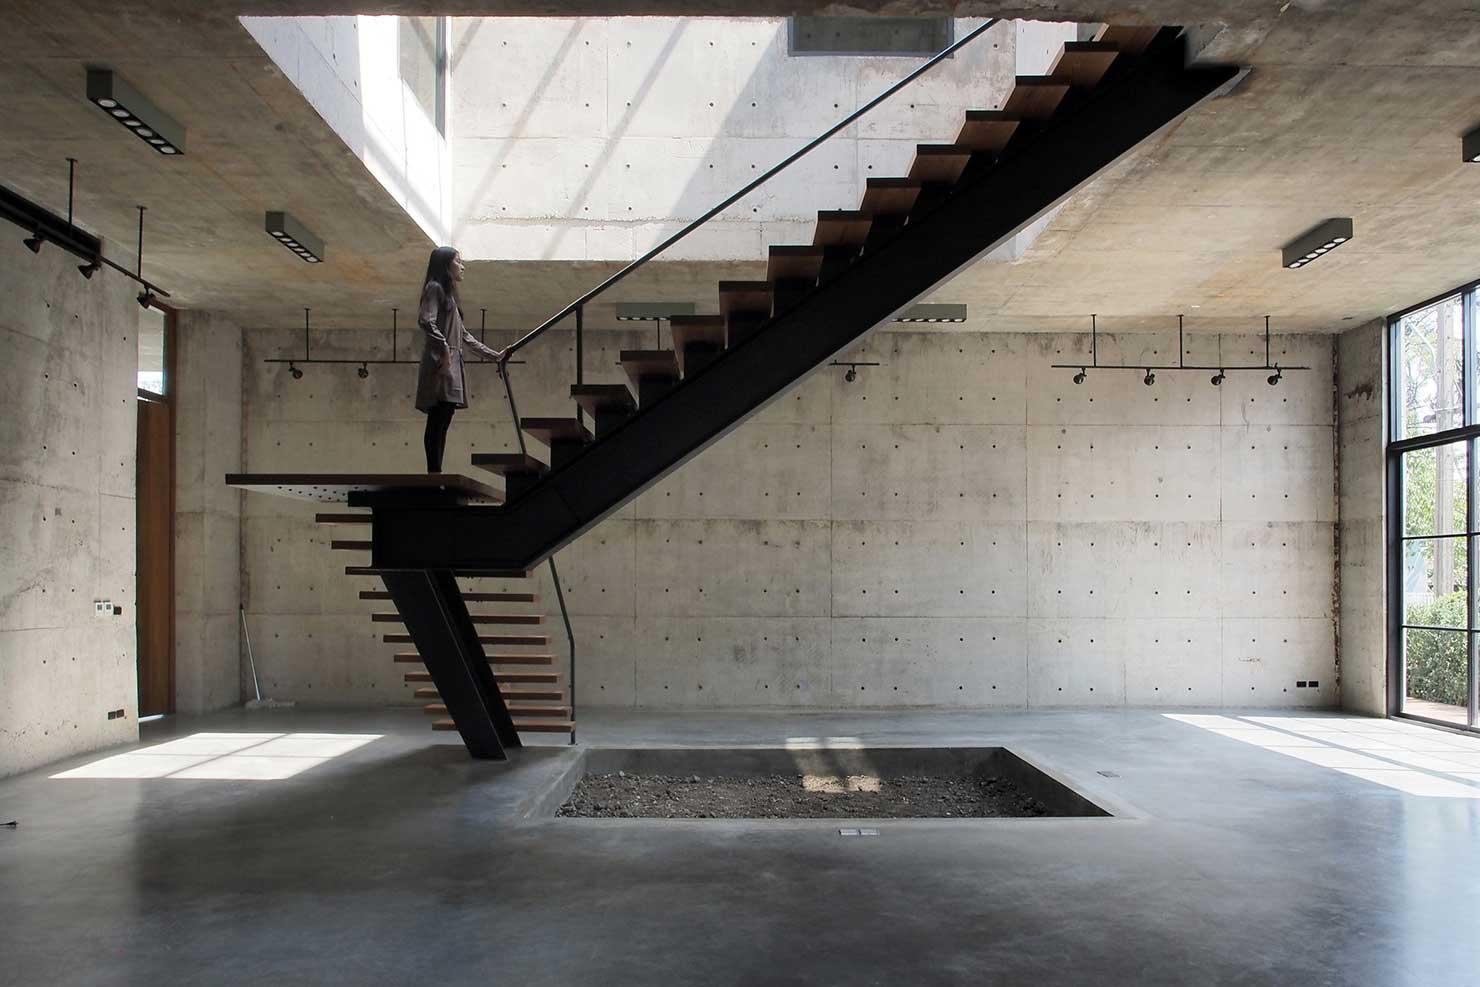 construcao-flavio-machado-arquitetura-escada-1